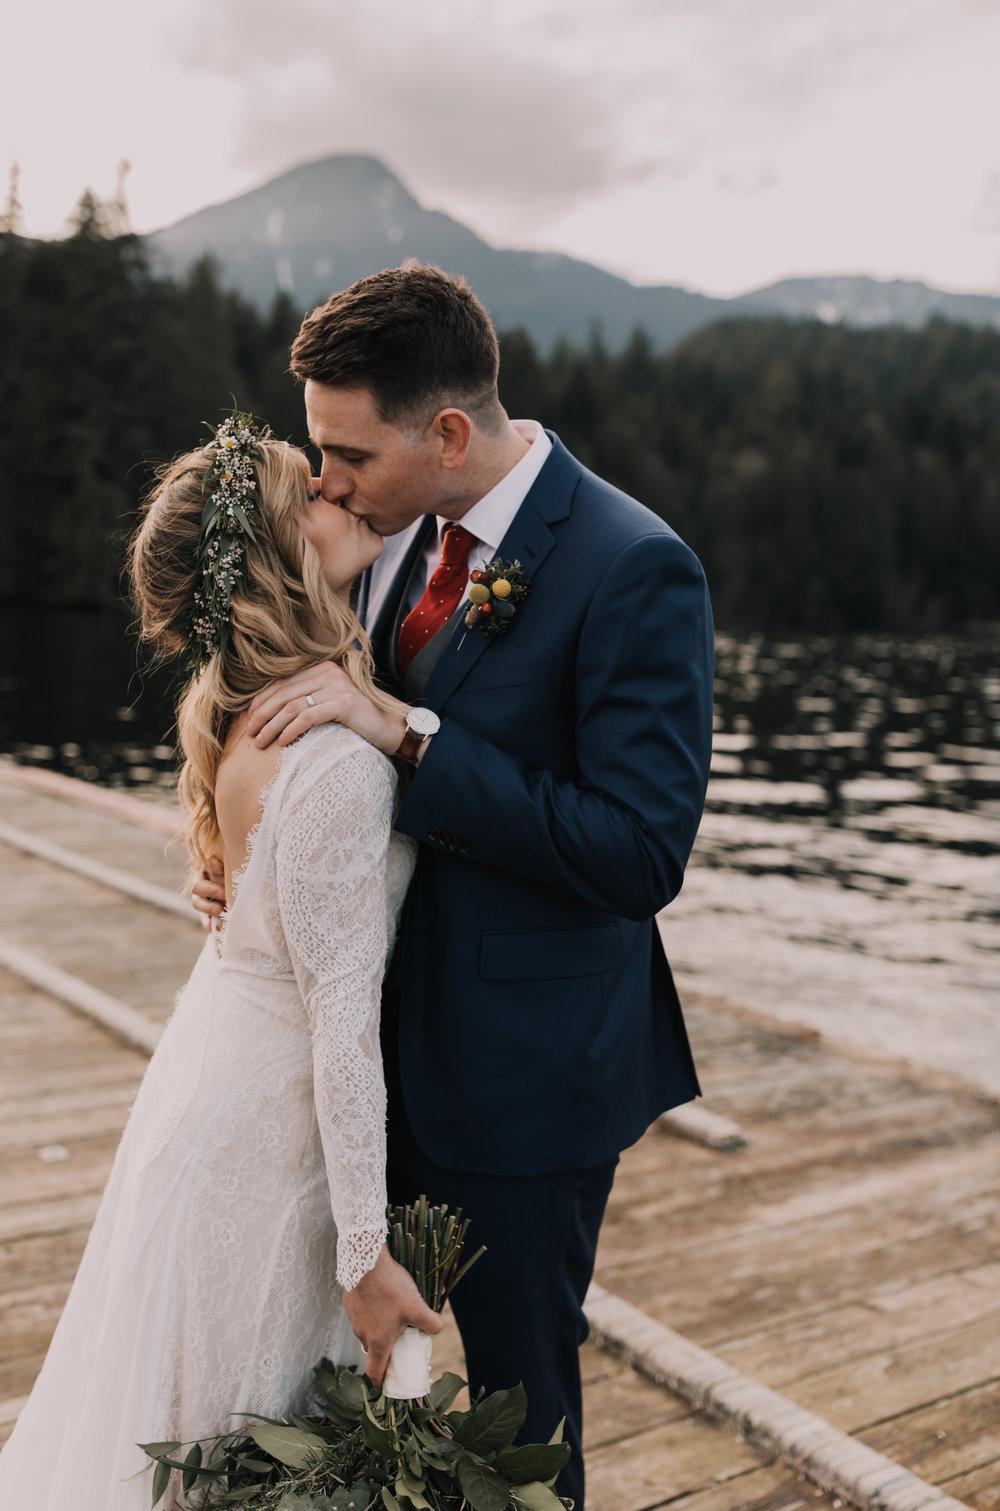 Sunshine Coast Wedding Photos - Mountain Wedding Photos - Sunshine Coast Wedding Photographer - Vancouver Wedding Photographer - Jennifer Picard185-1.JPG